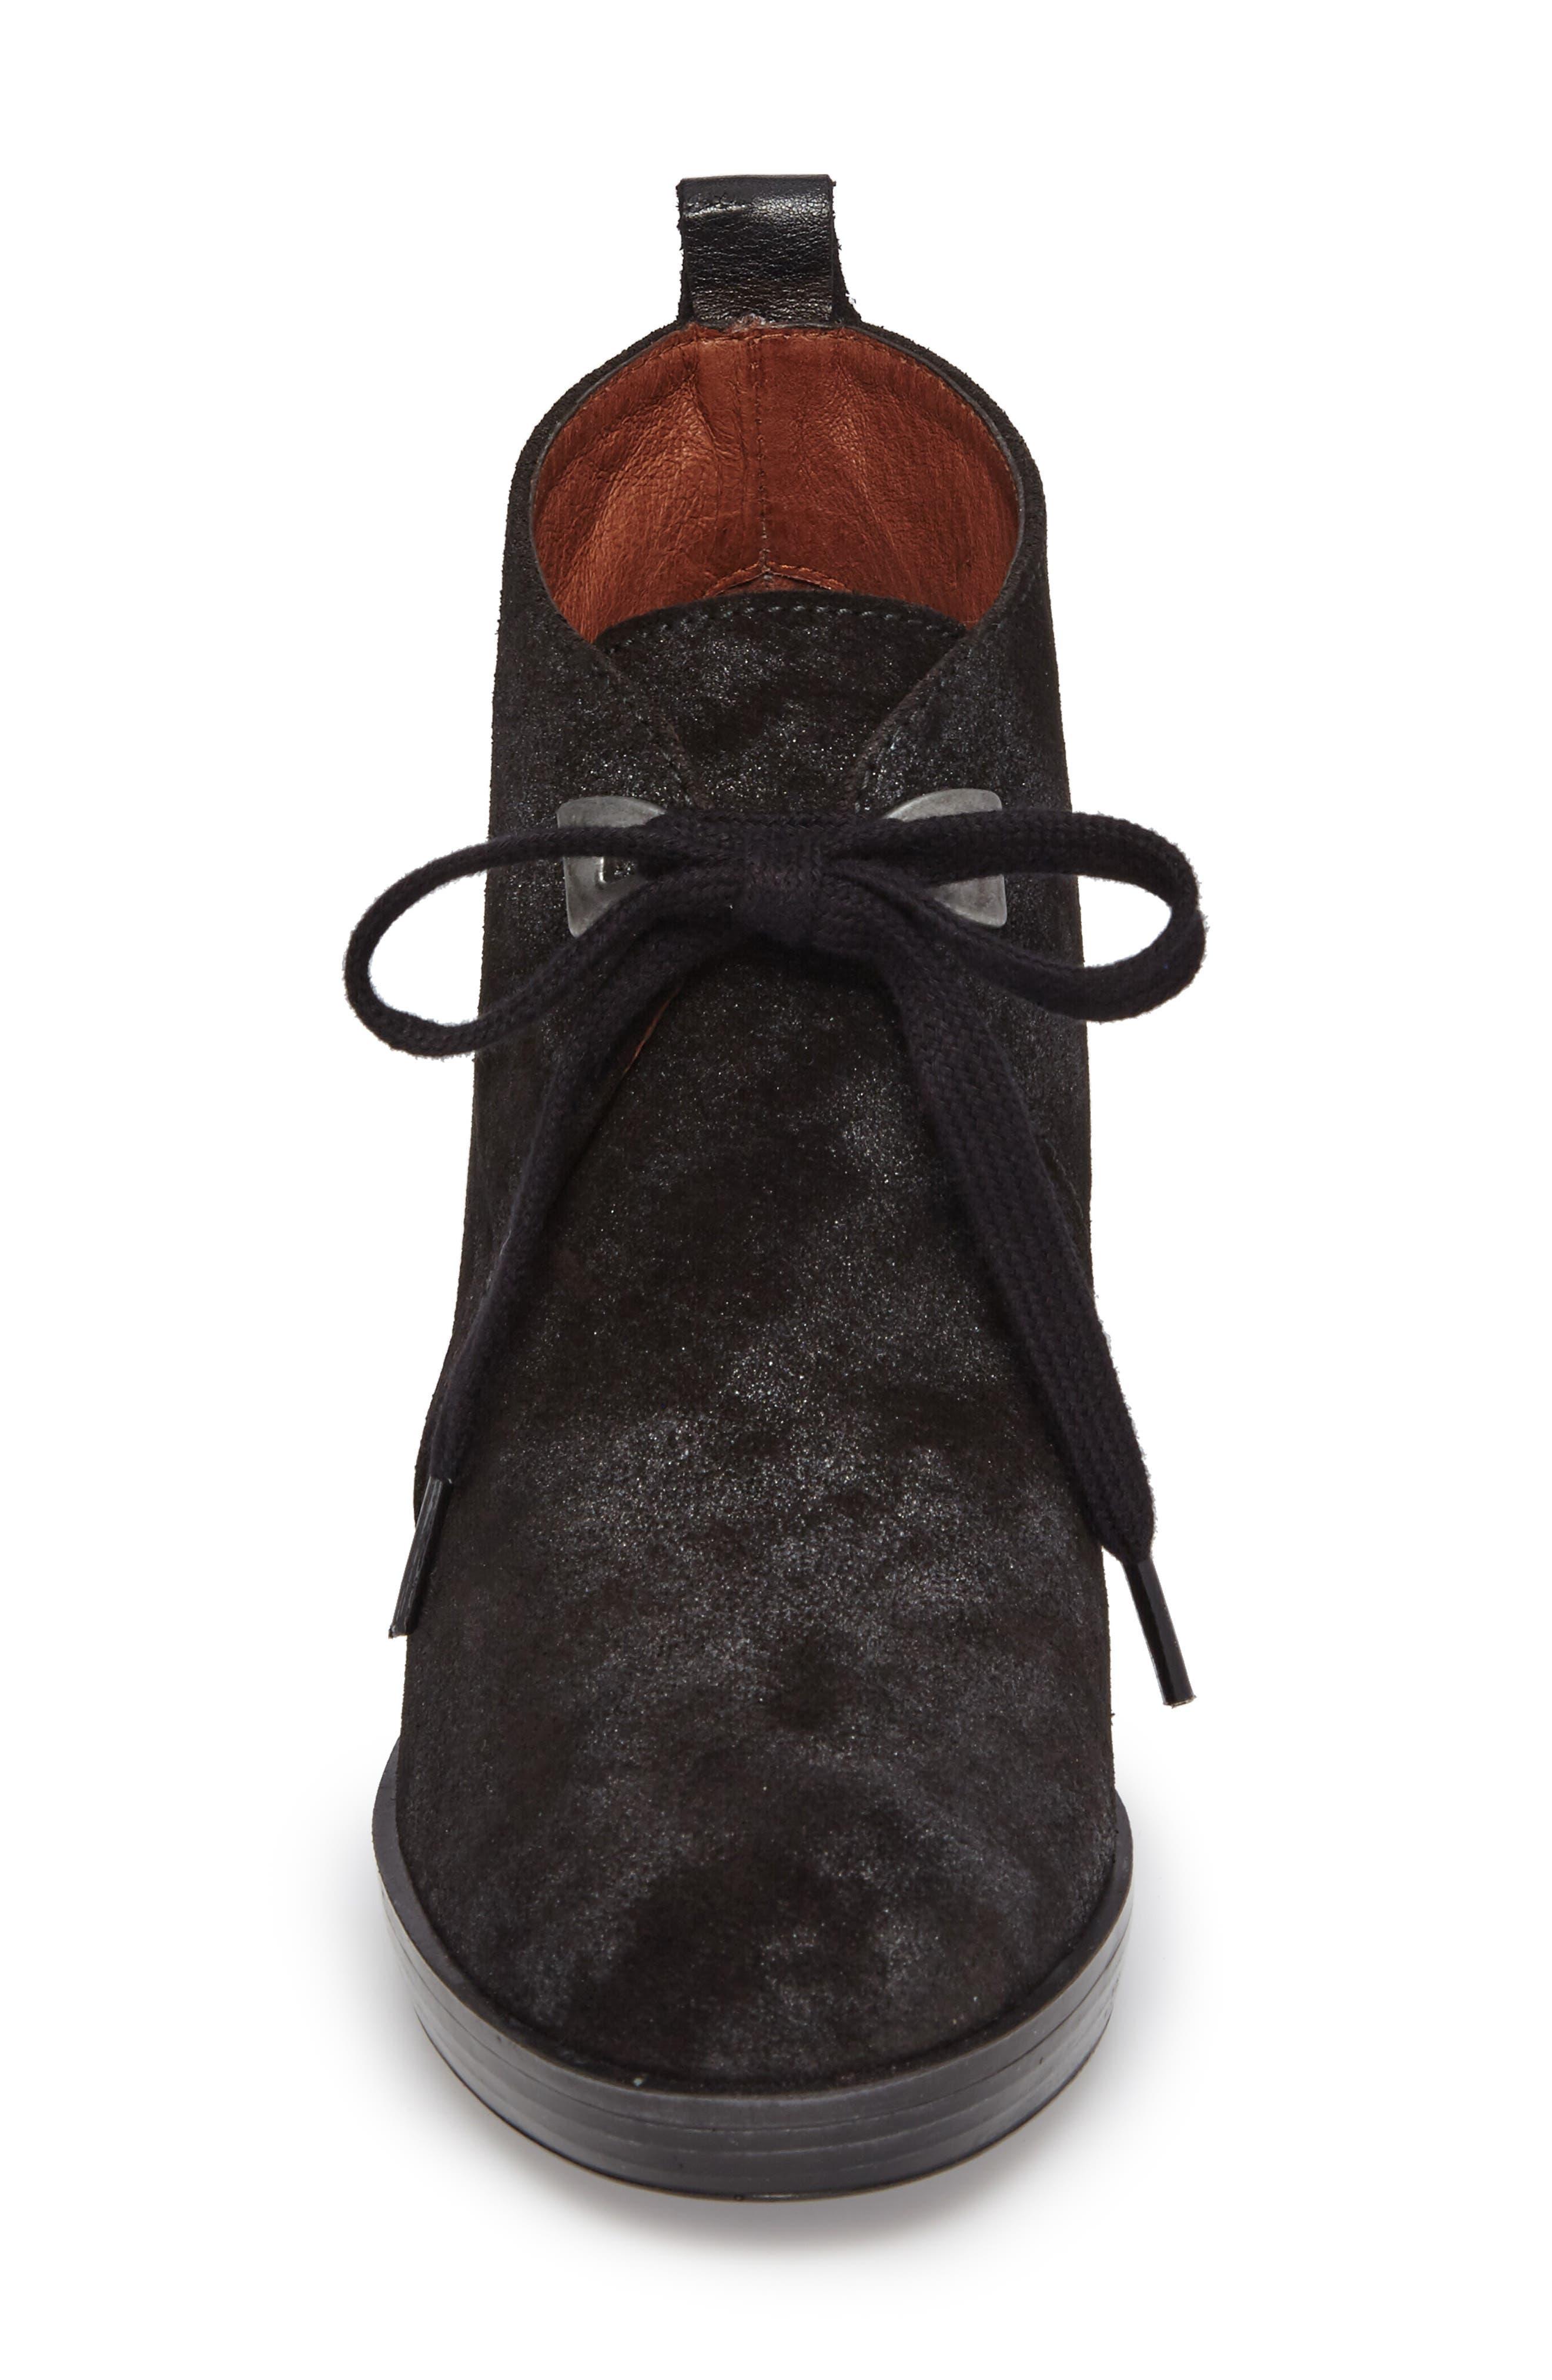 Dasia Bow Bootie,                             Alternate thumbnail 4, color,                             Brut Black Leather